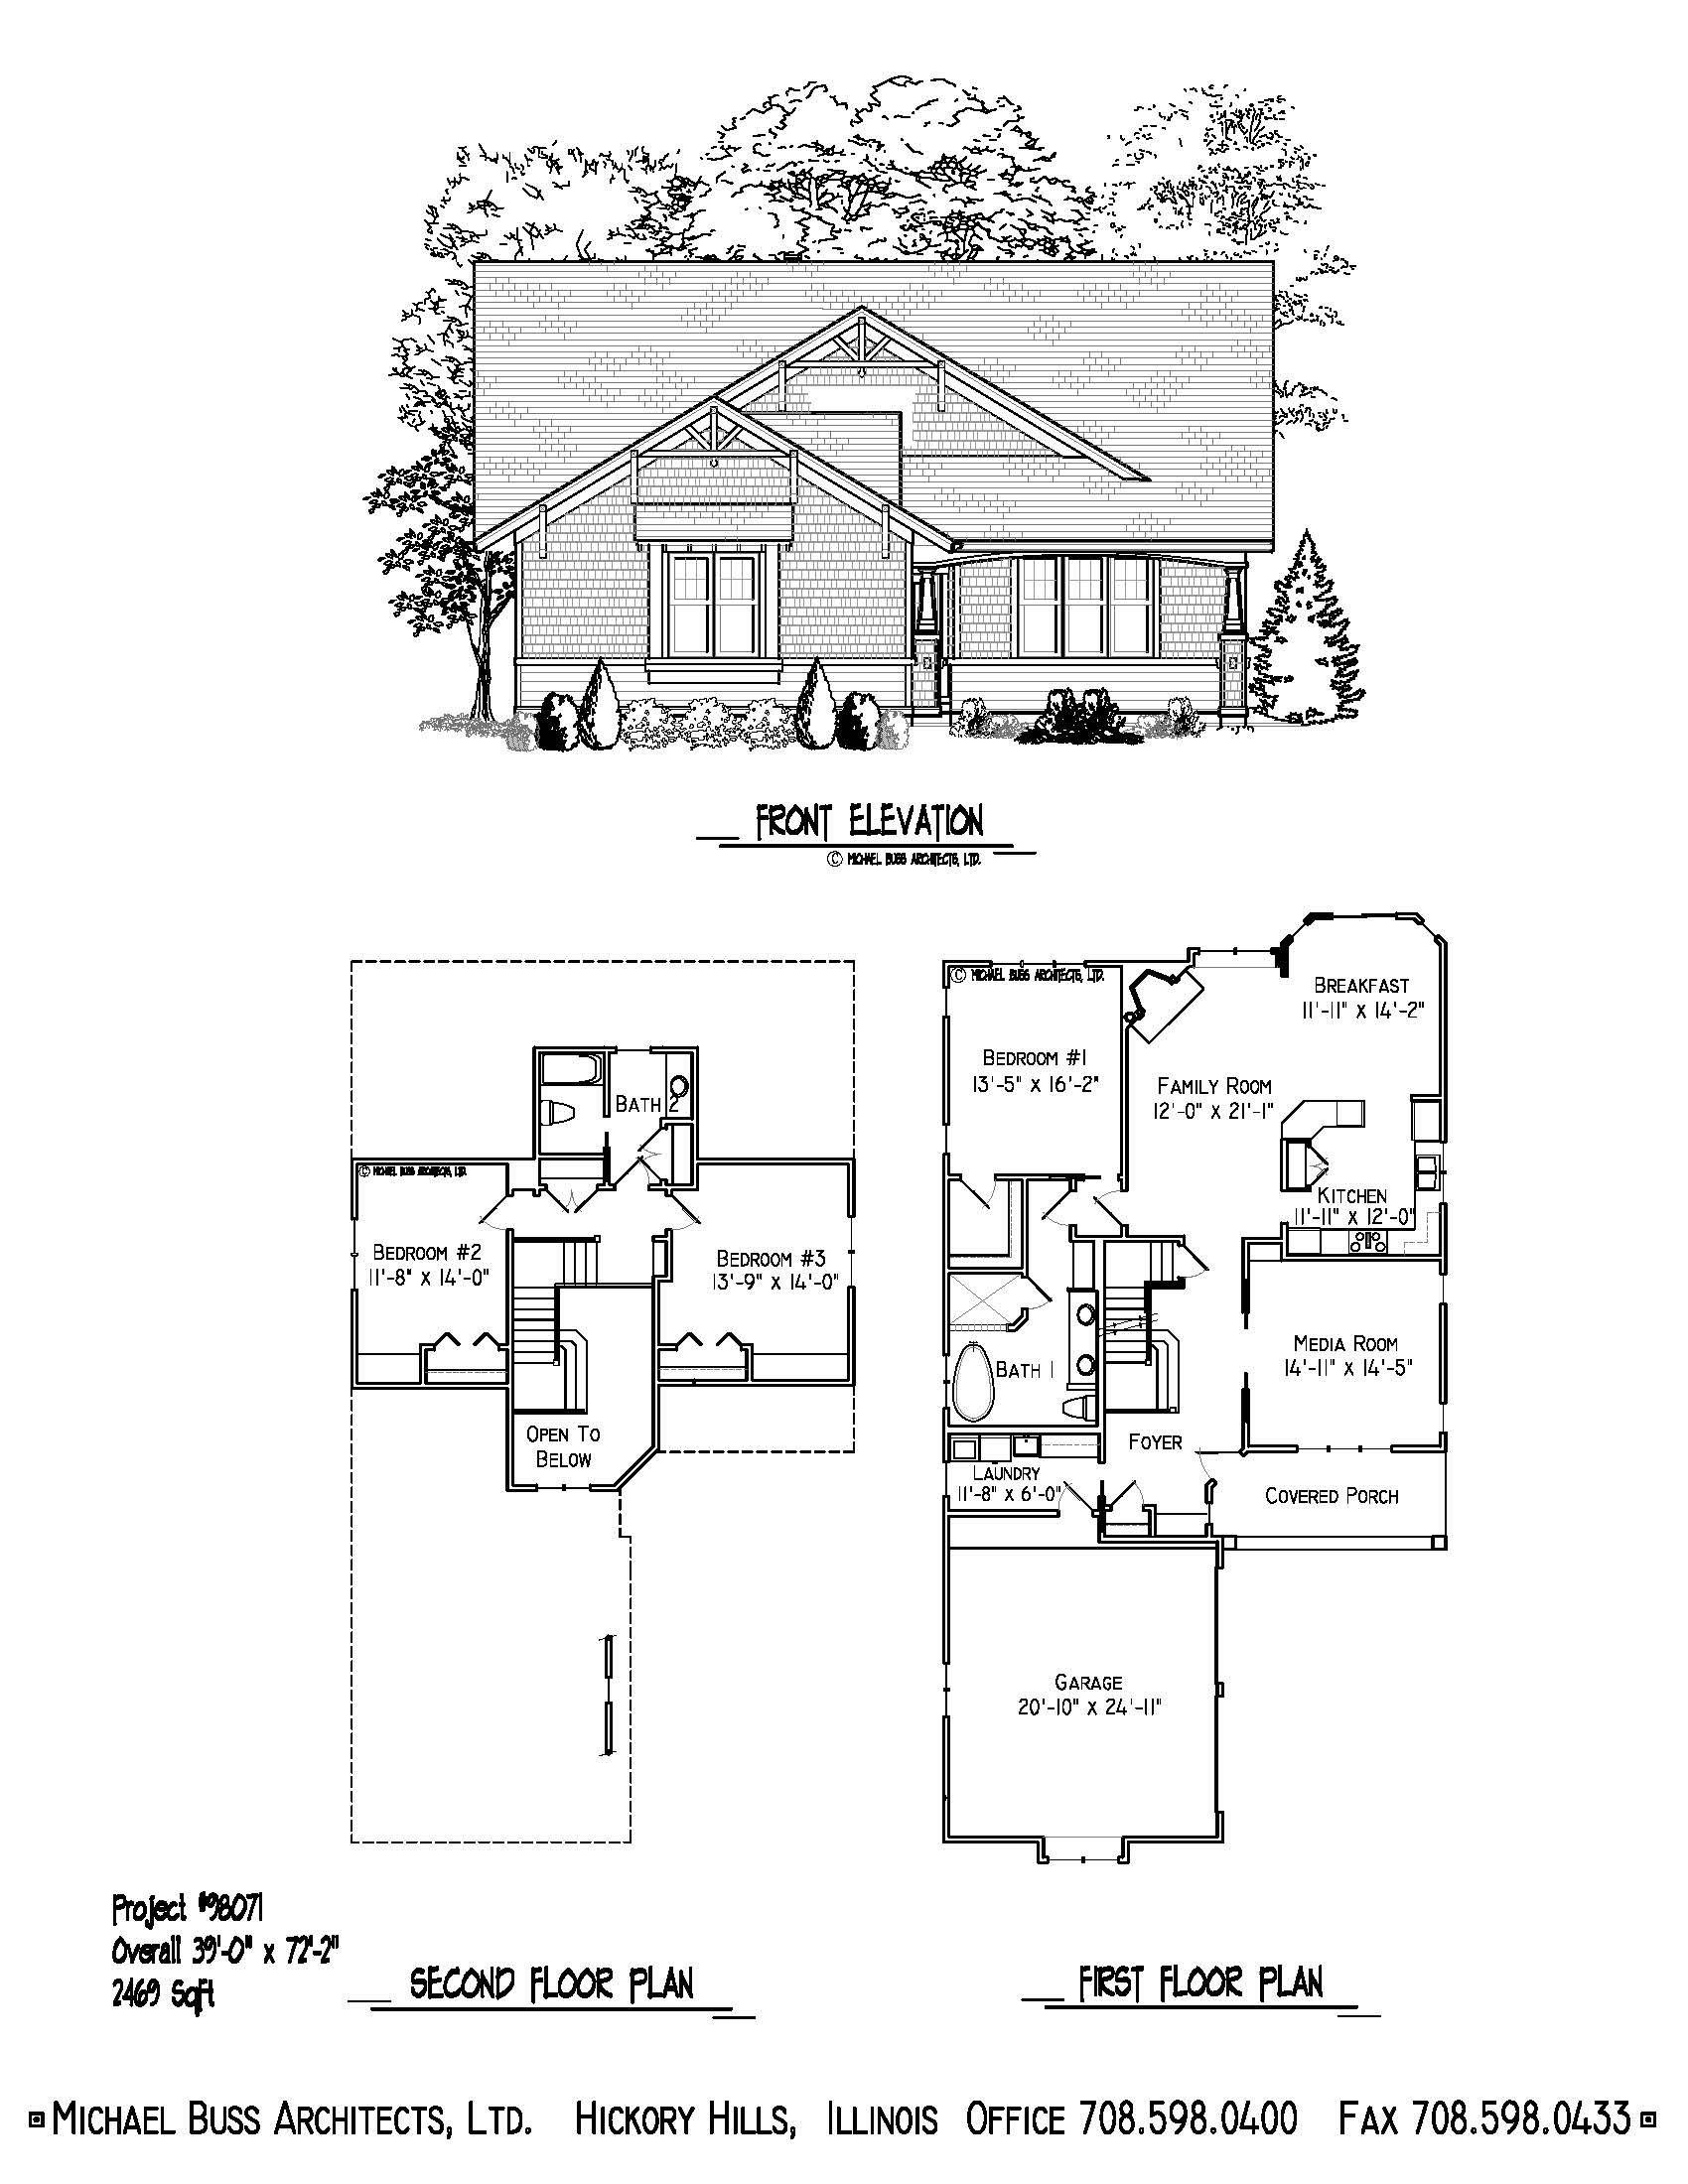 cac64b4019aec65eb21e3a9b538a0db9 Narrow Lot House Plans With Side Load Garages on narrow lot house style, house plans with attached garage, charleston style in back house garage,